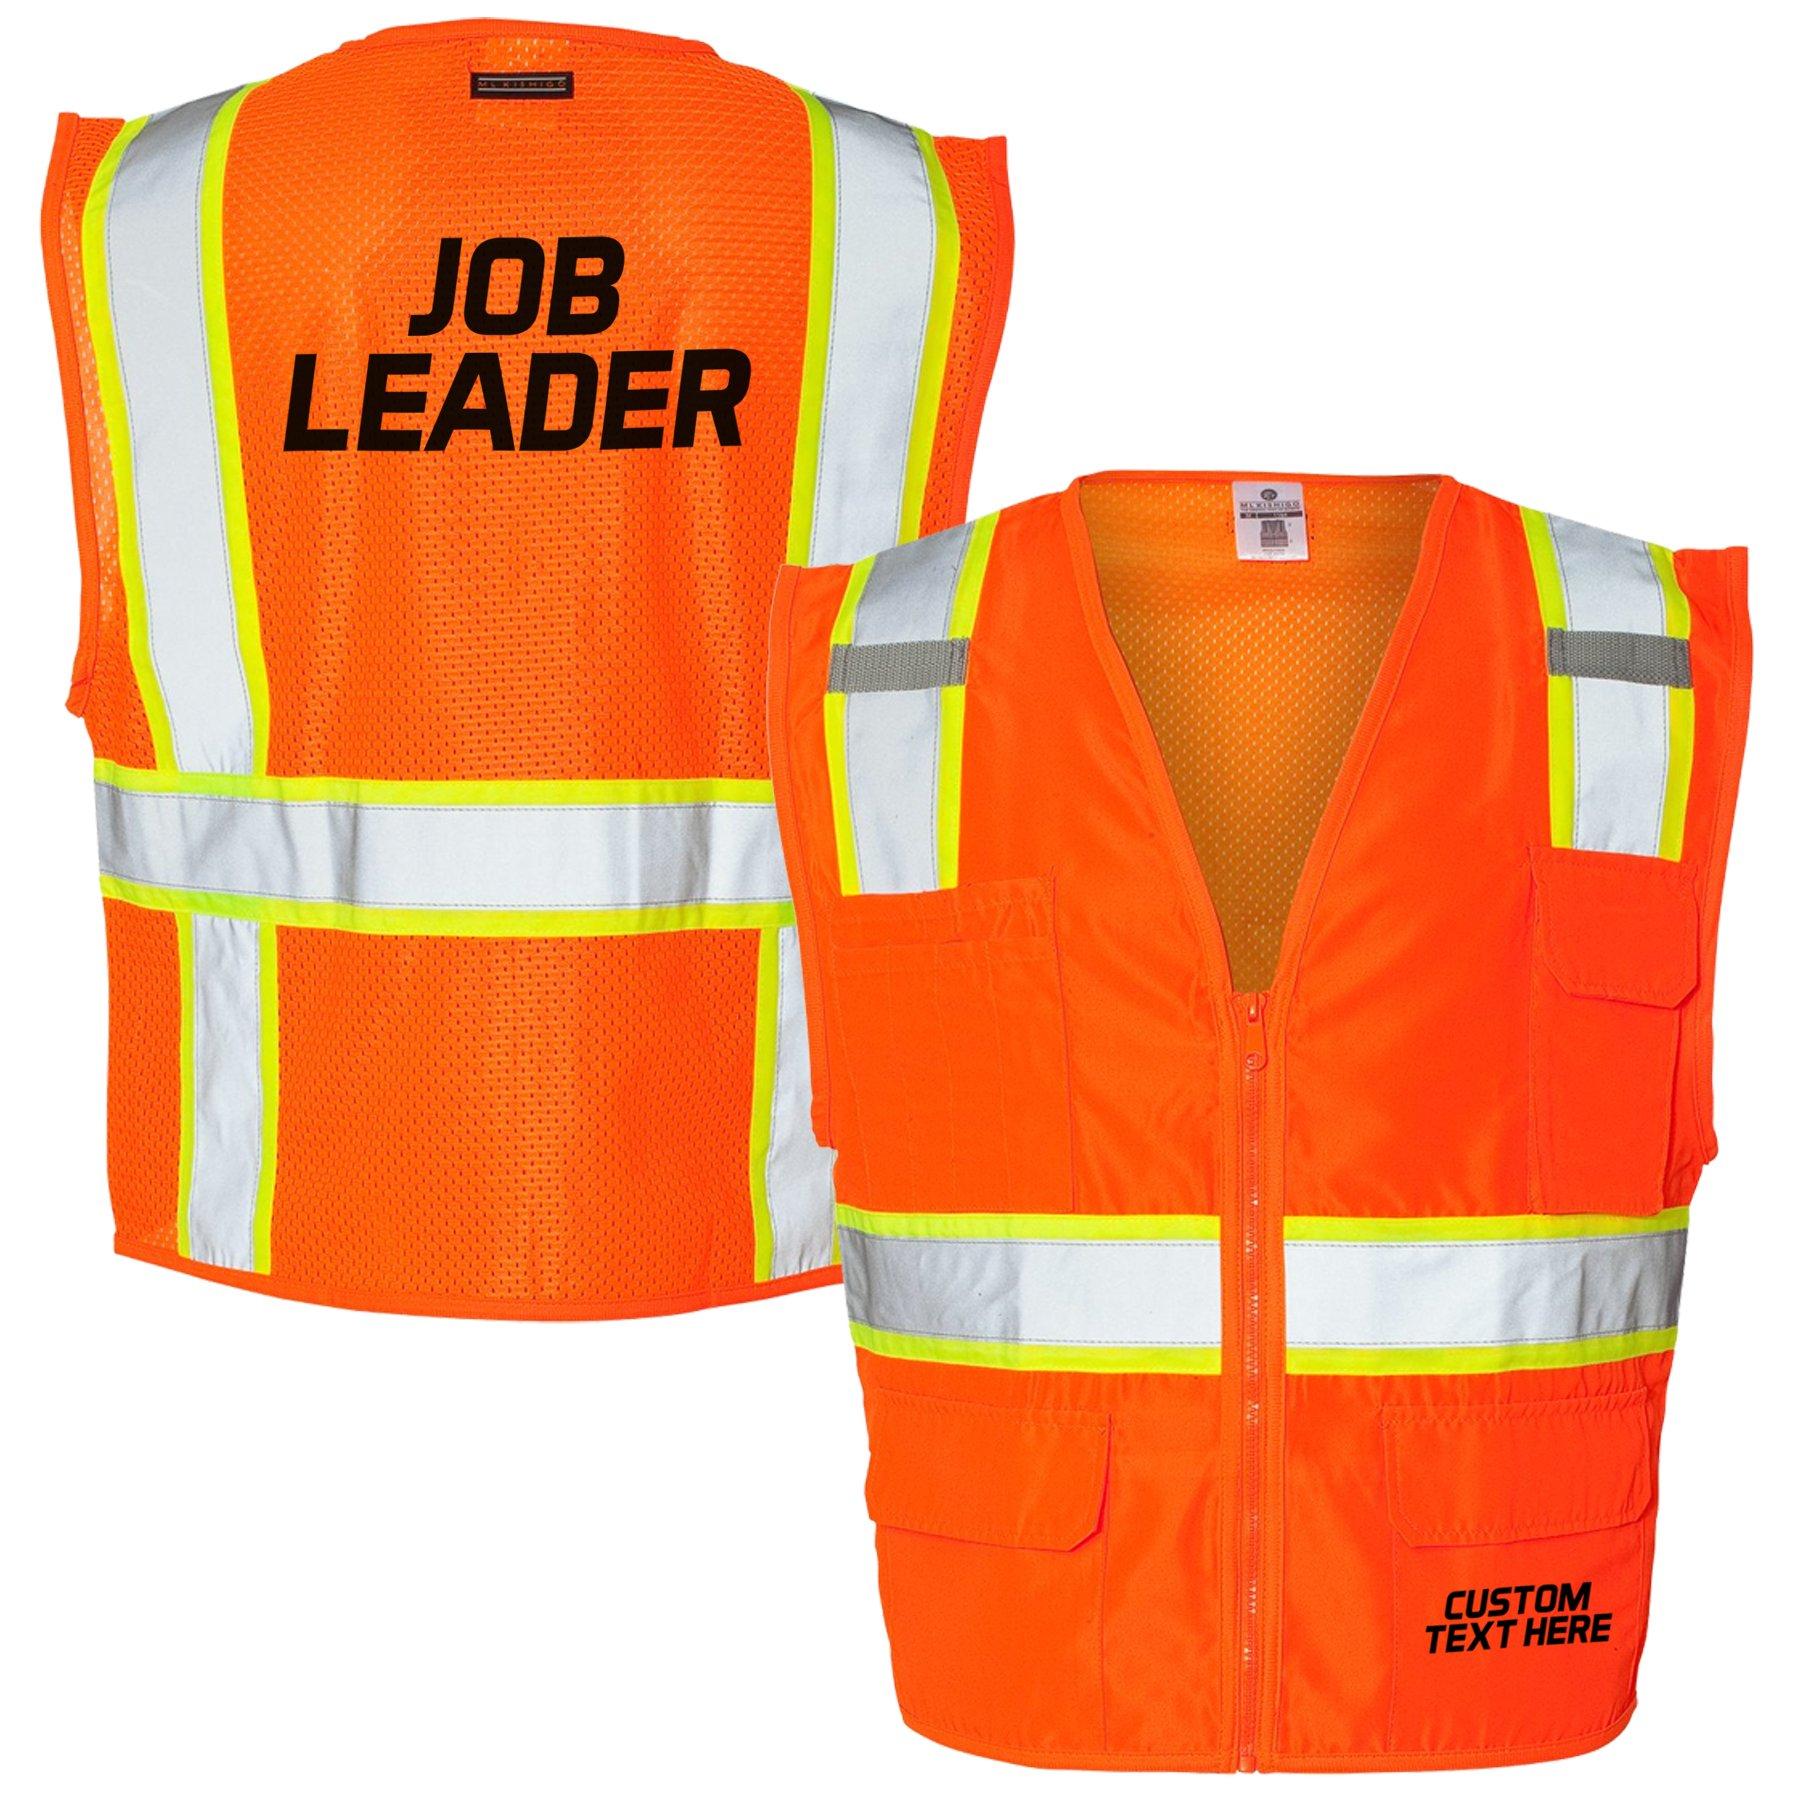 Custom Kamal Ohava Personalized Mesh Back Reflective Safety Vest, Orange, XL